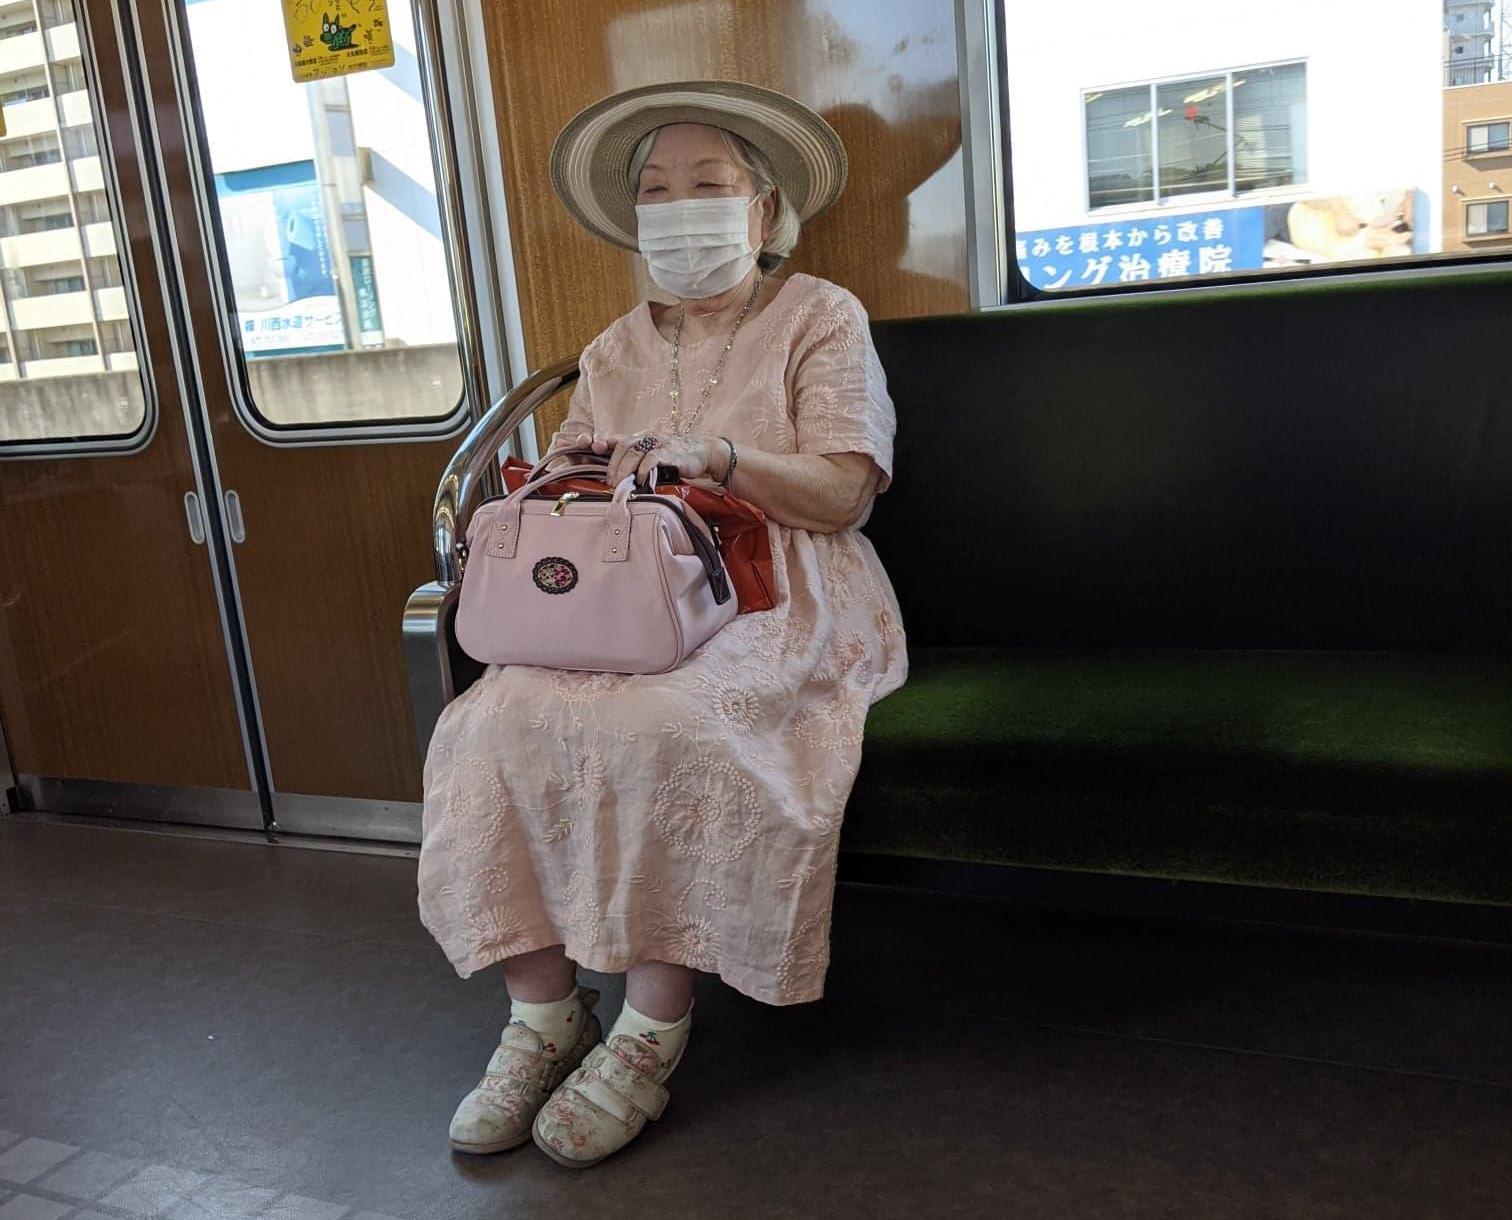 Fashion oddities in Japan